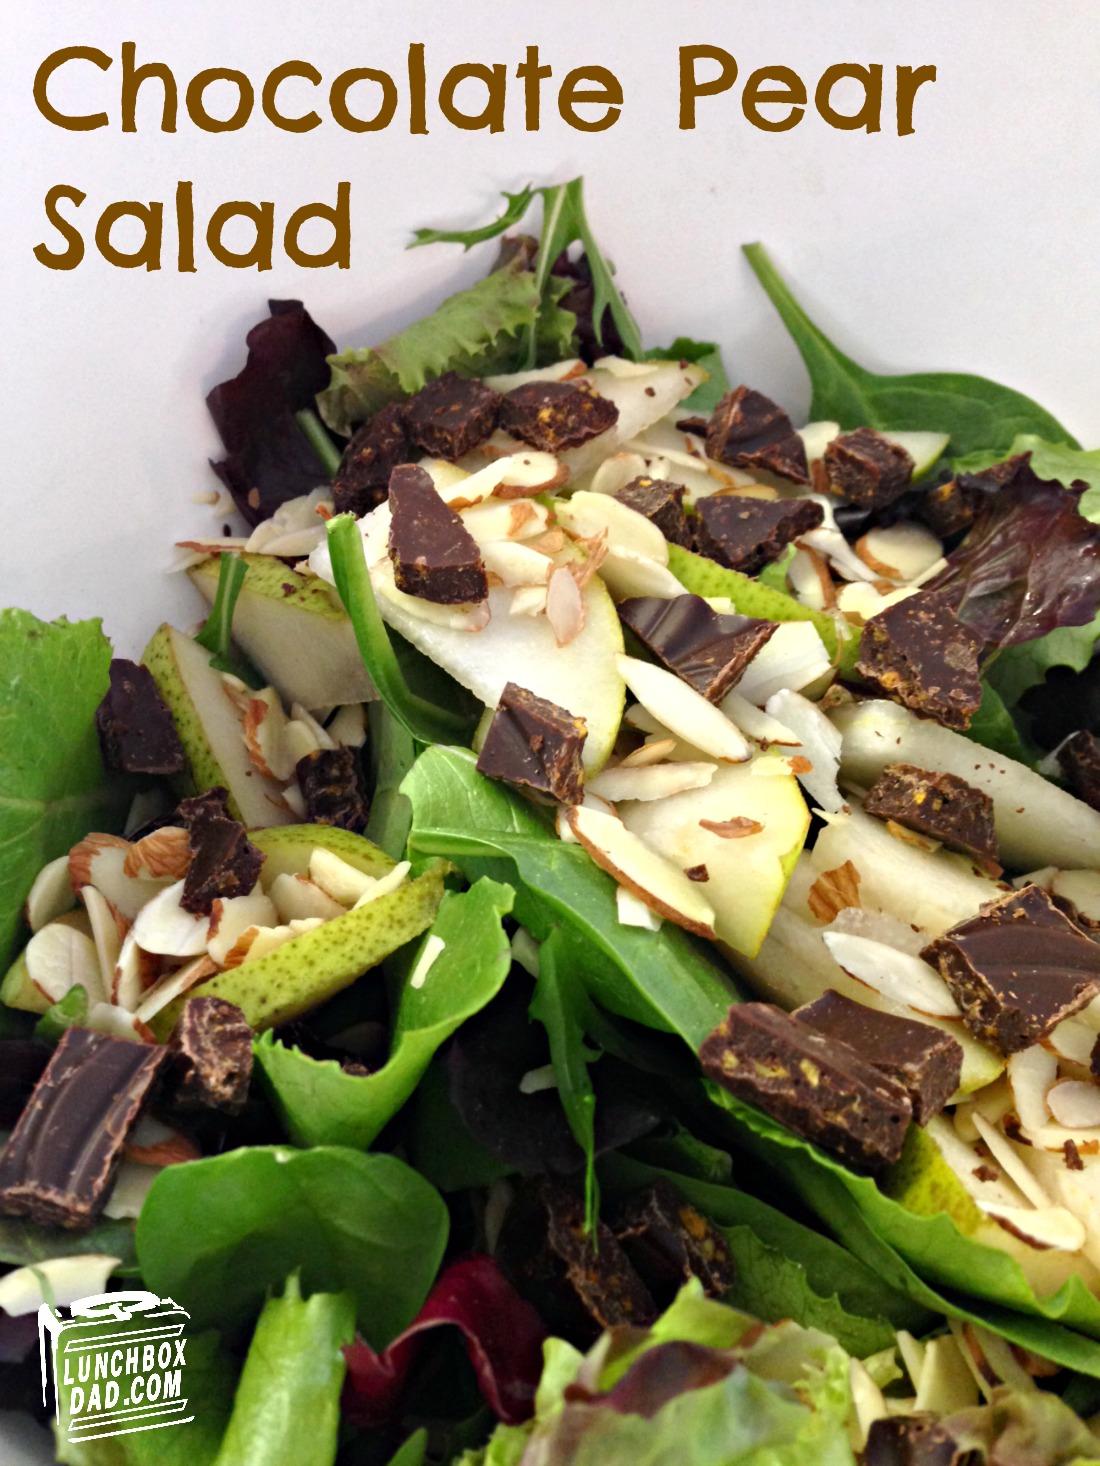 Chocolate Pear Salad with Chuao Honeycomb Chocolate